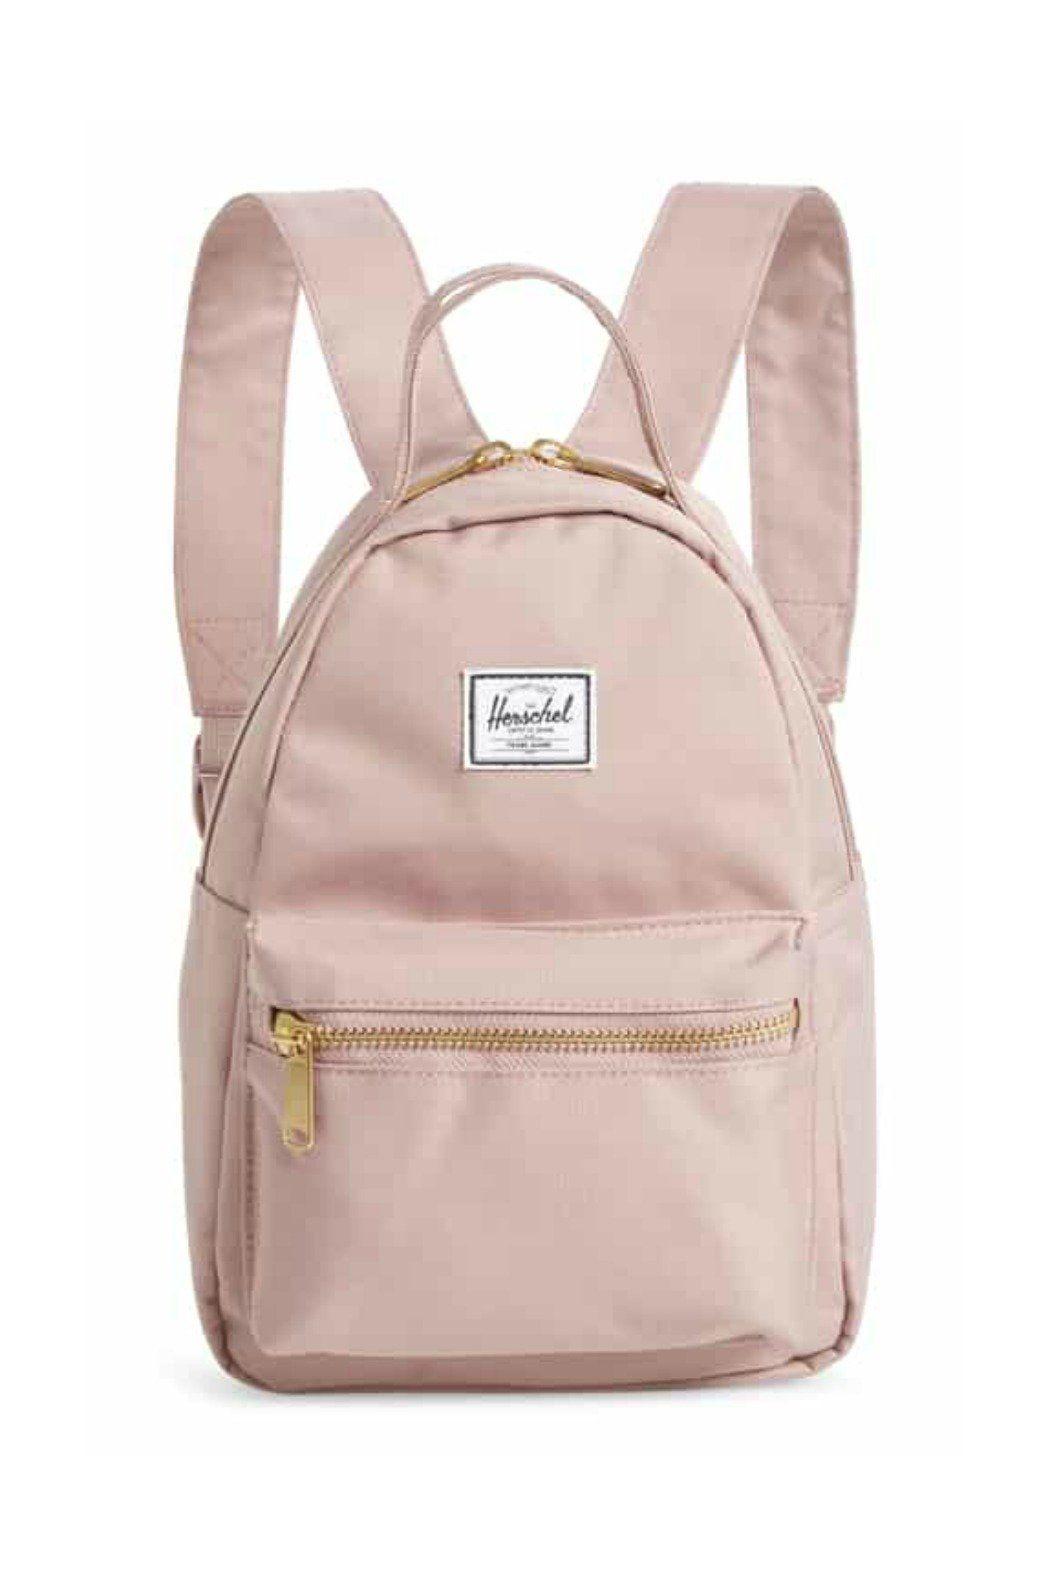 Herschel Nova Mini Backpack in Satin Ash Rose  e8fbf22416f6b